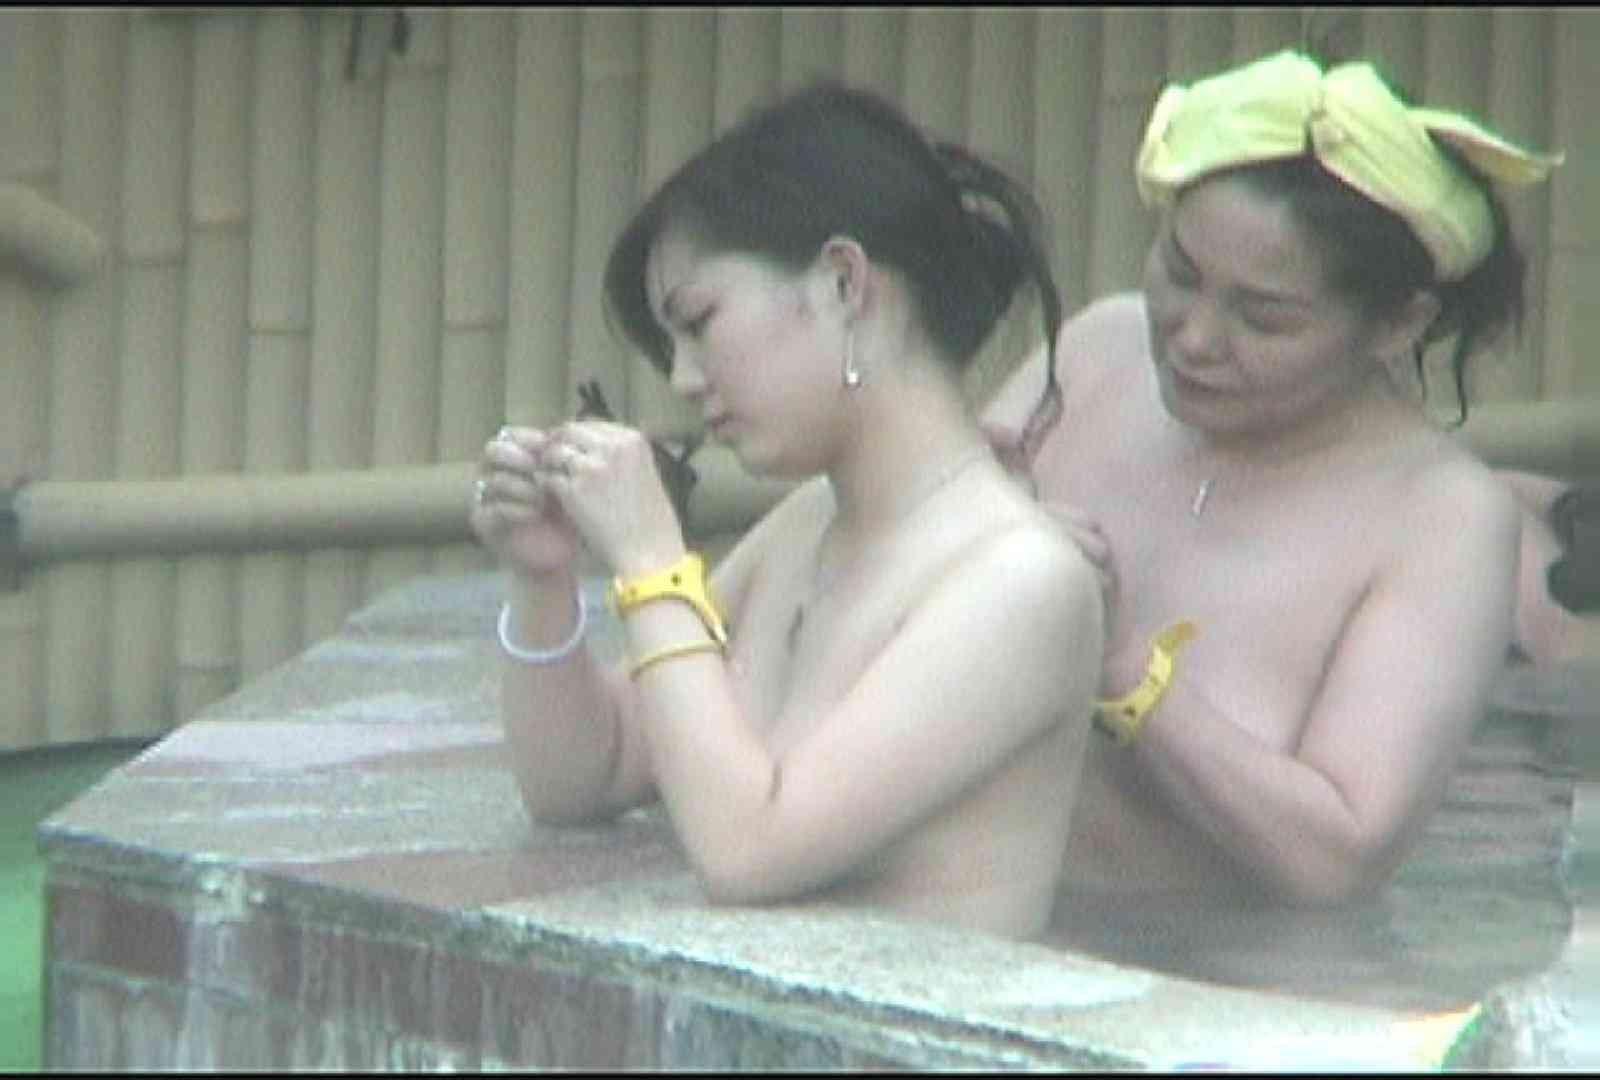 Aquaな露天風呂Vol.145 盗撮   OLセックス  106画像 70